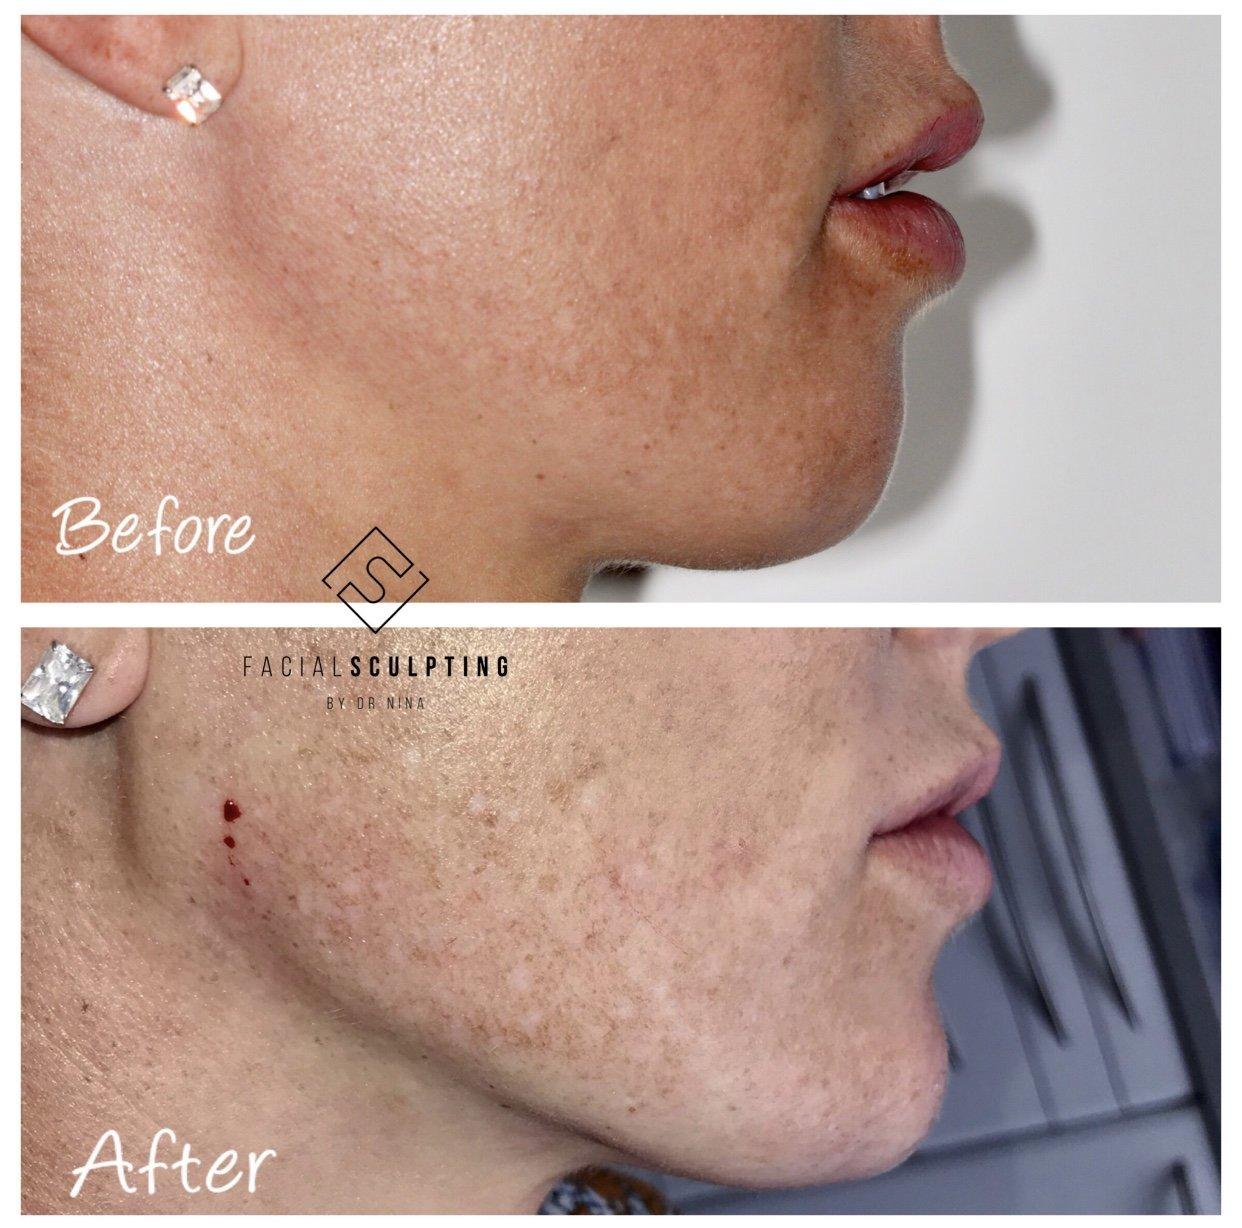 Jawline fillers | Facial Sculpting - Jawline Fillers